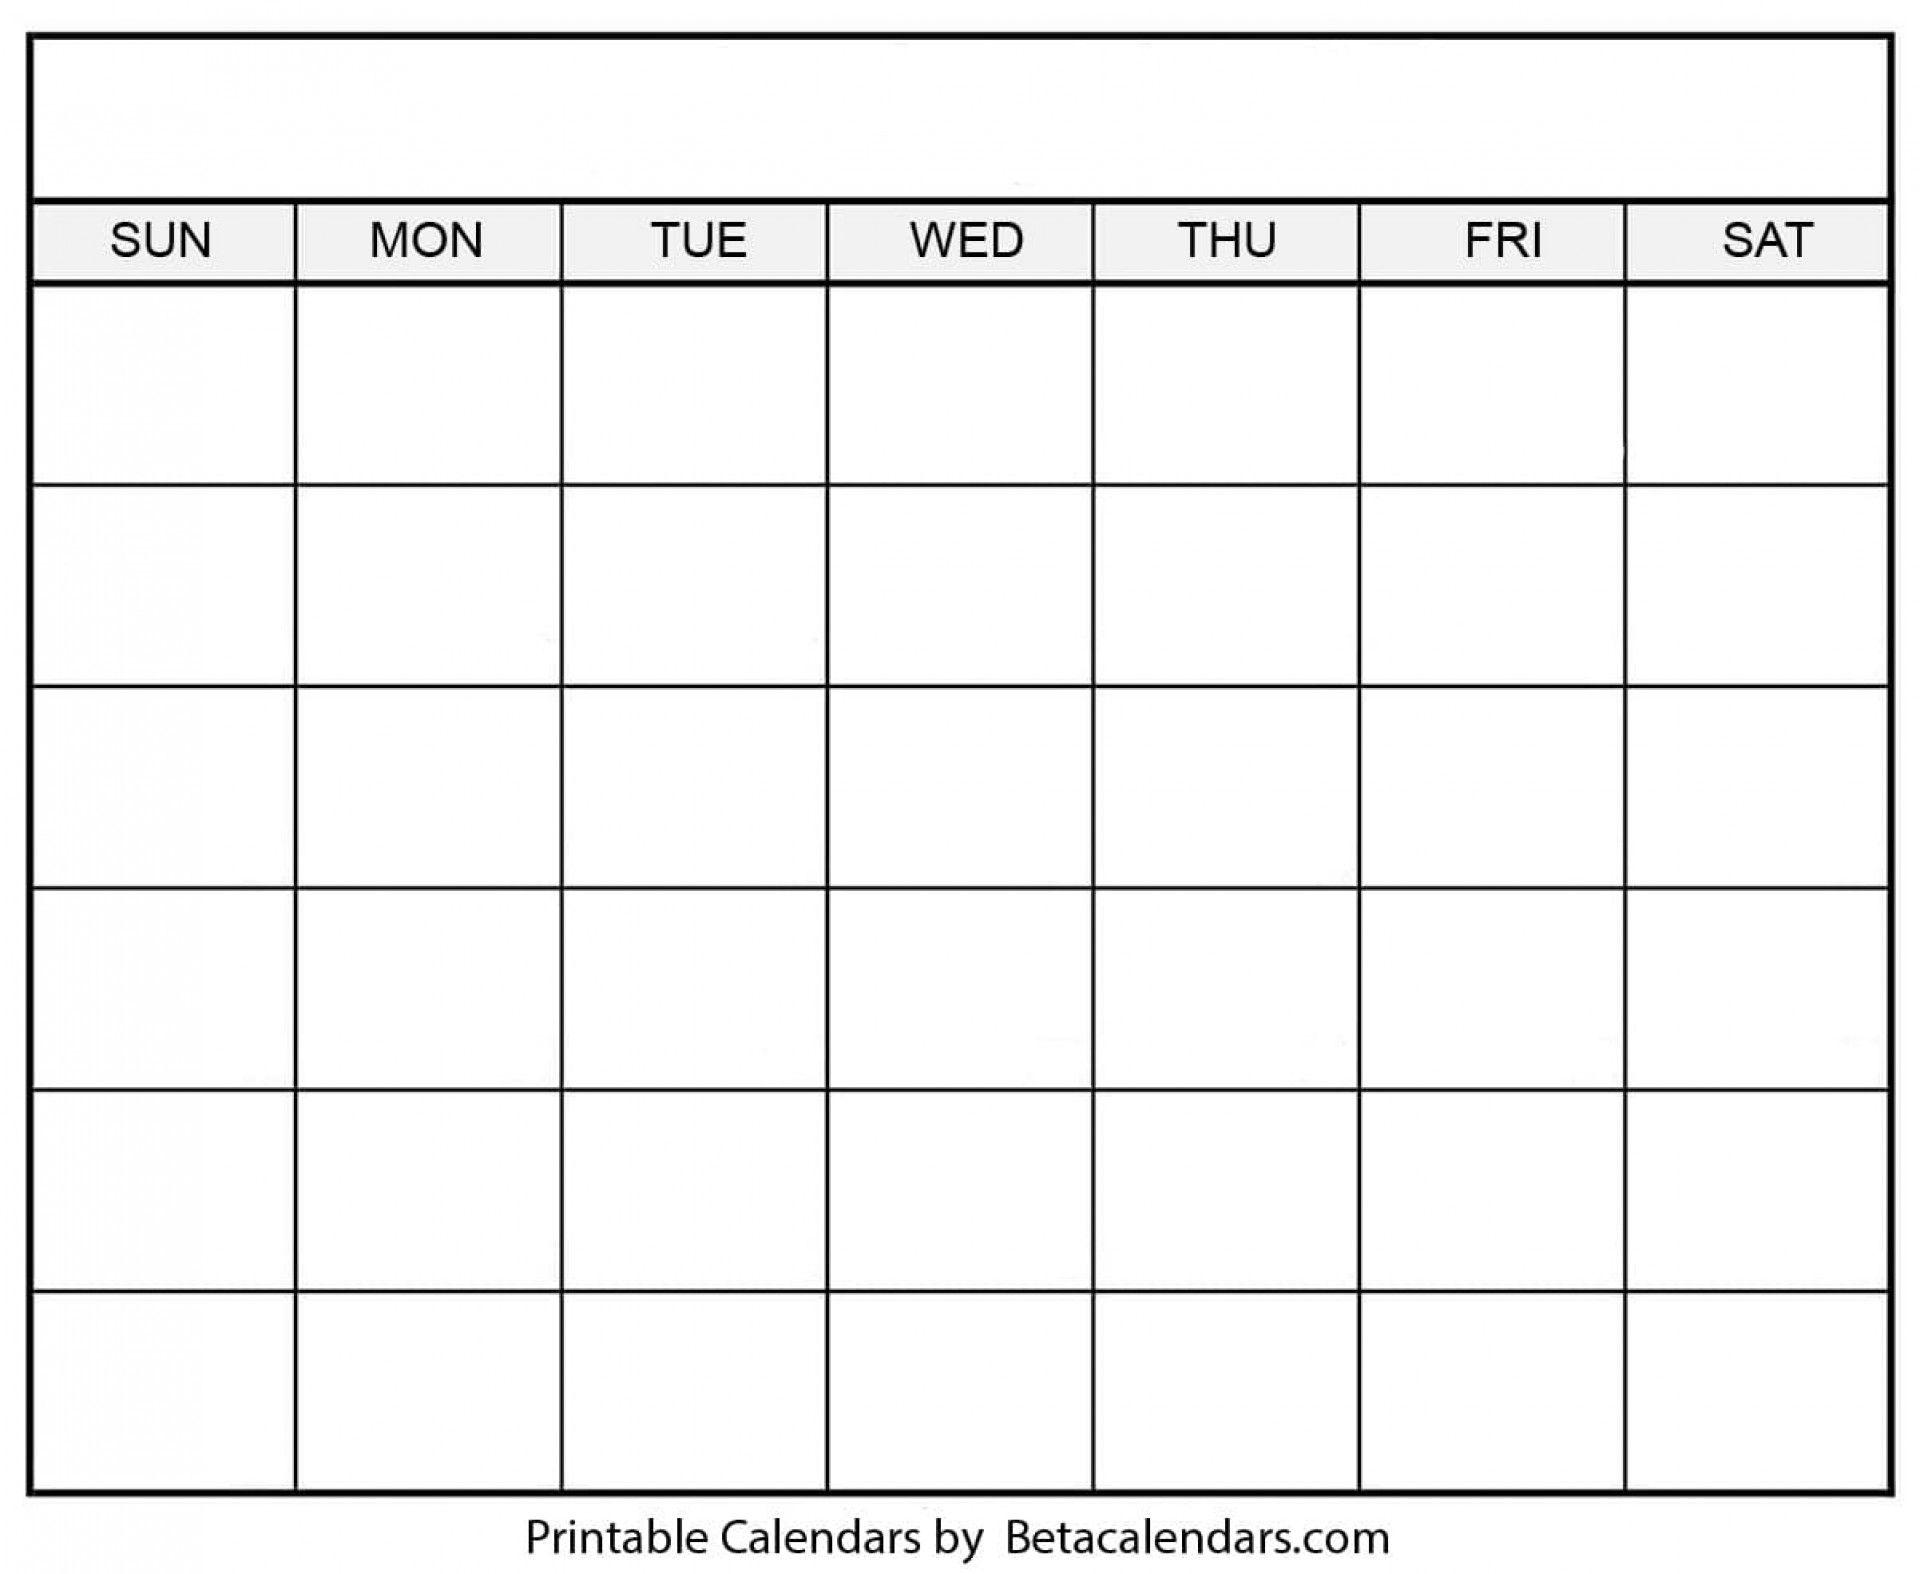 000 Fantastic 30 Day Calendar Template Highest Quality